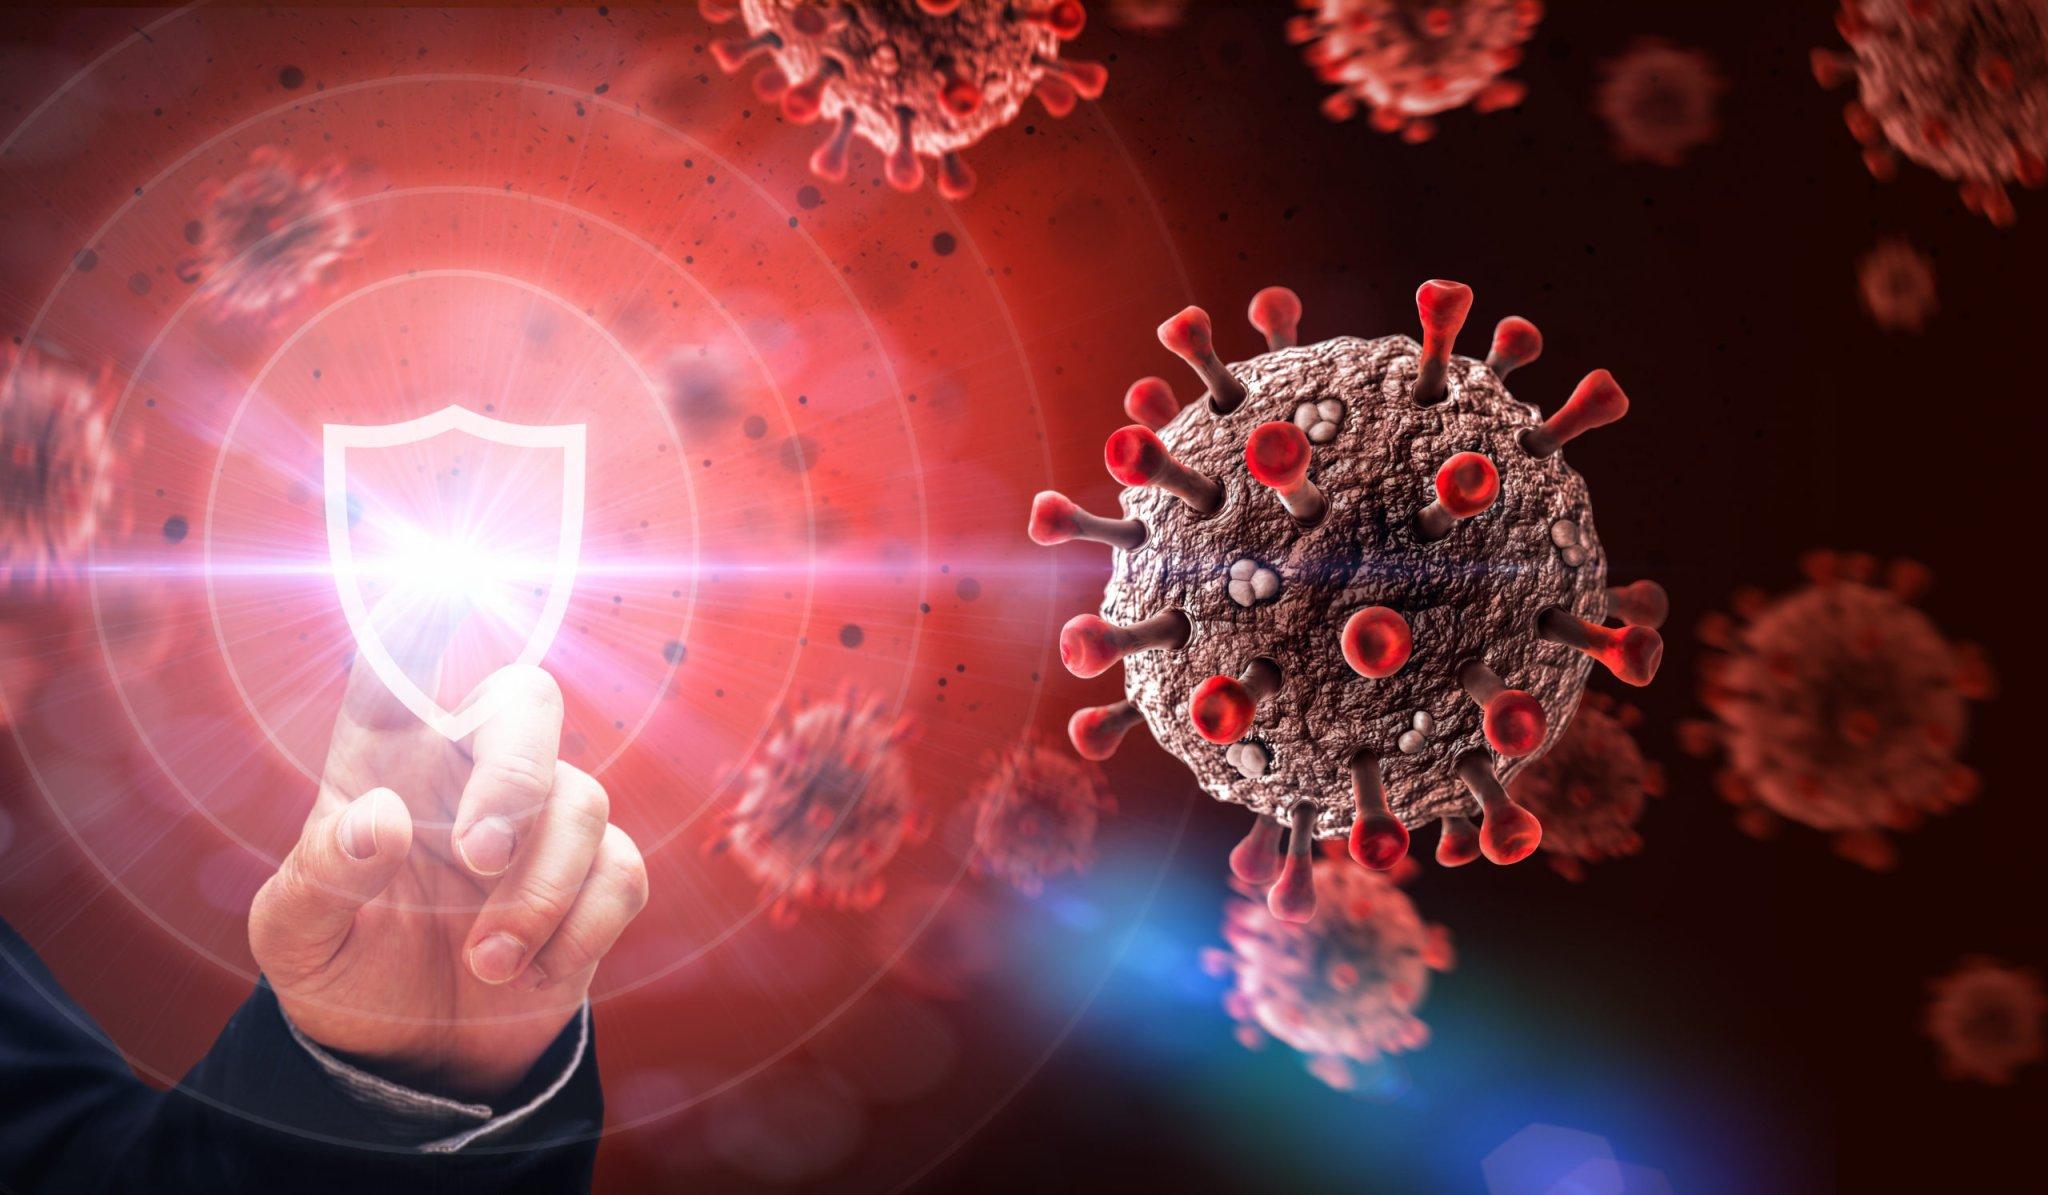 COVID-19 Increasing Risk of Cyberattacks for Digital Biopharma